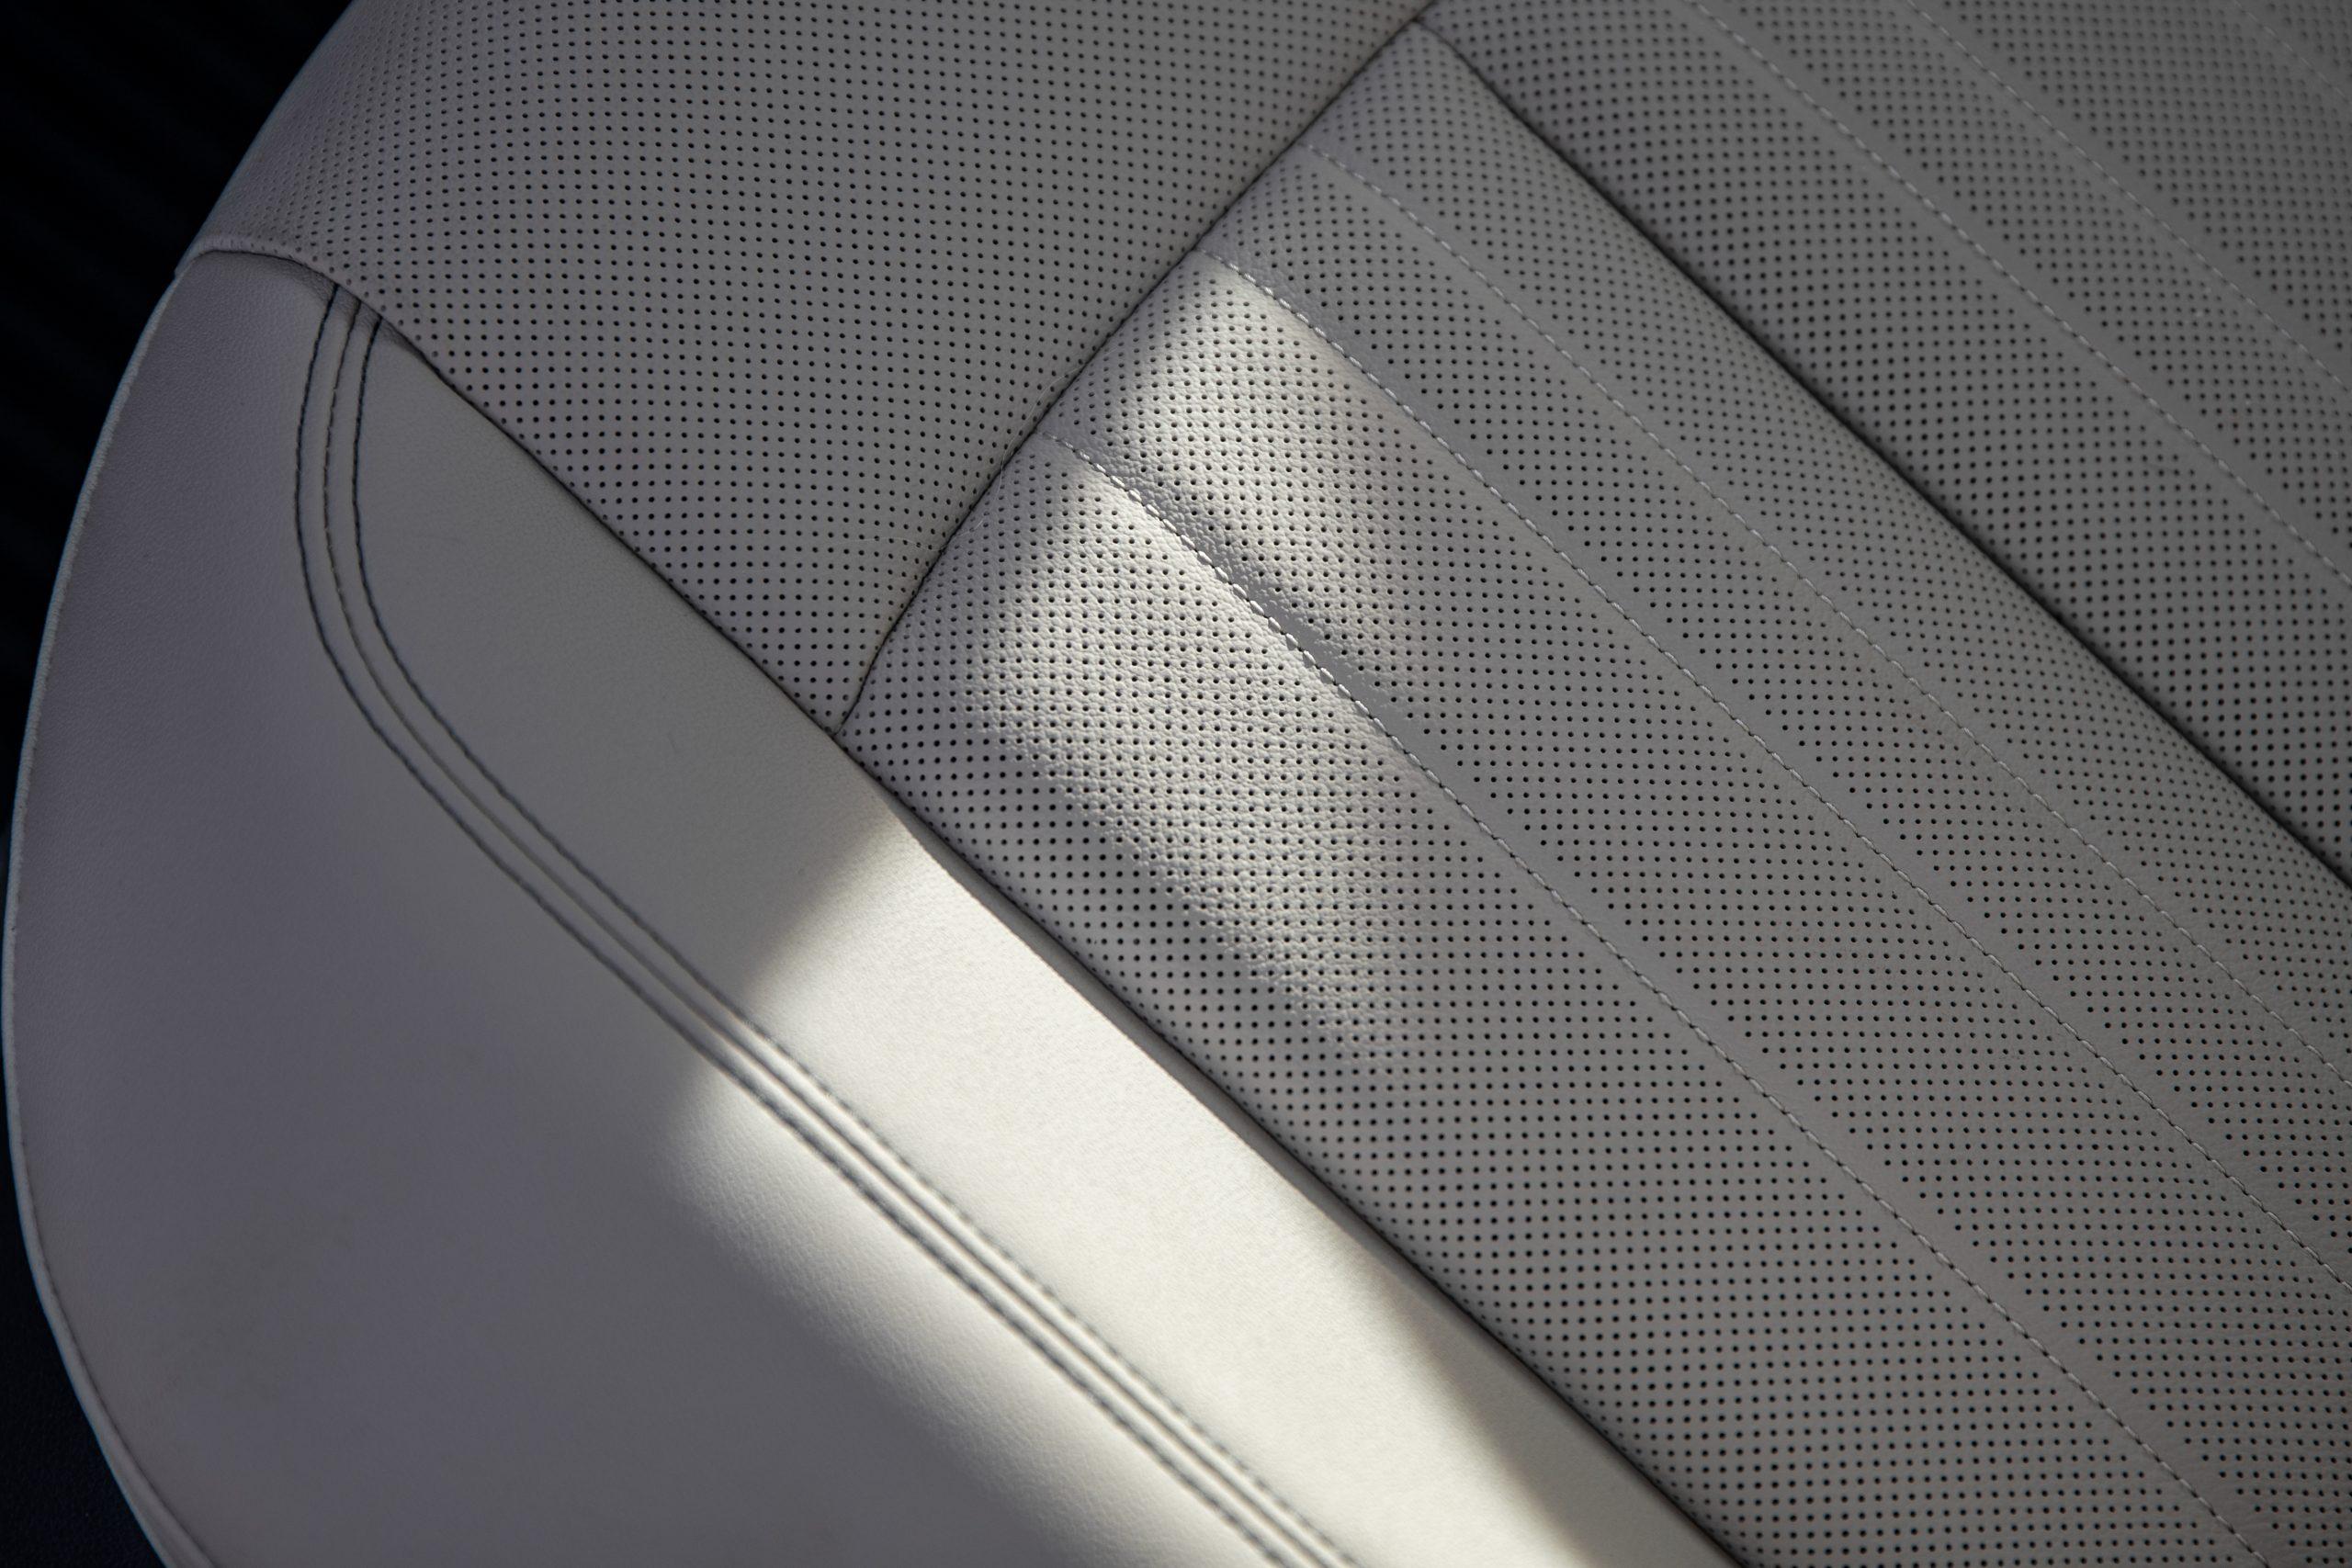 2020 Audi A6 allroad seat details